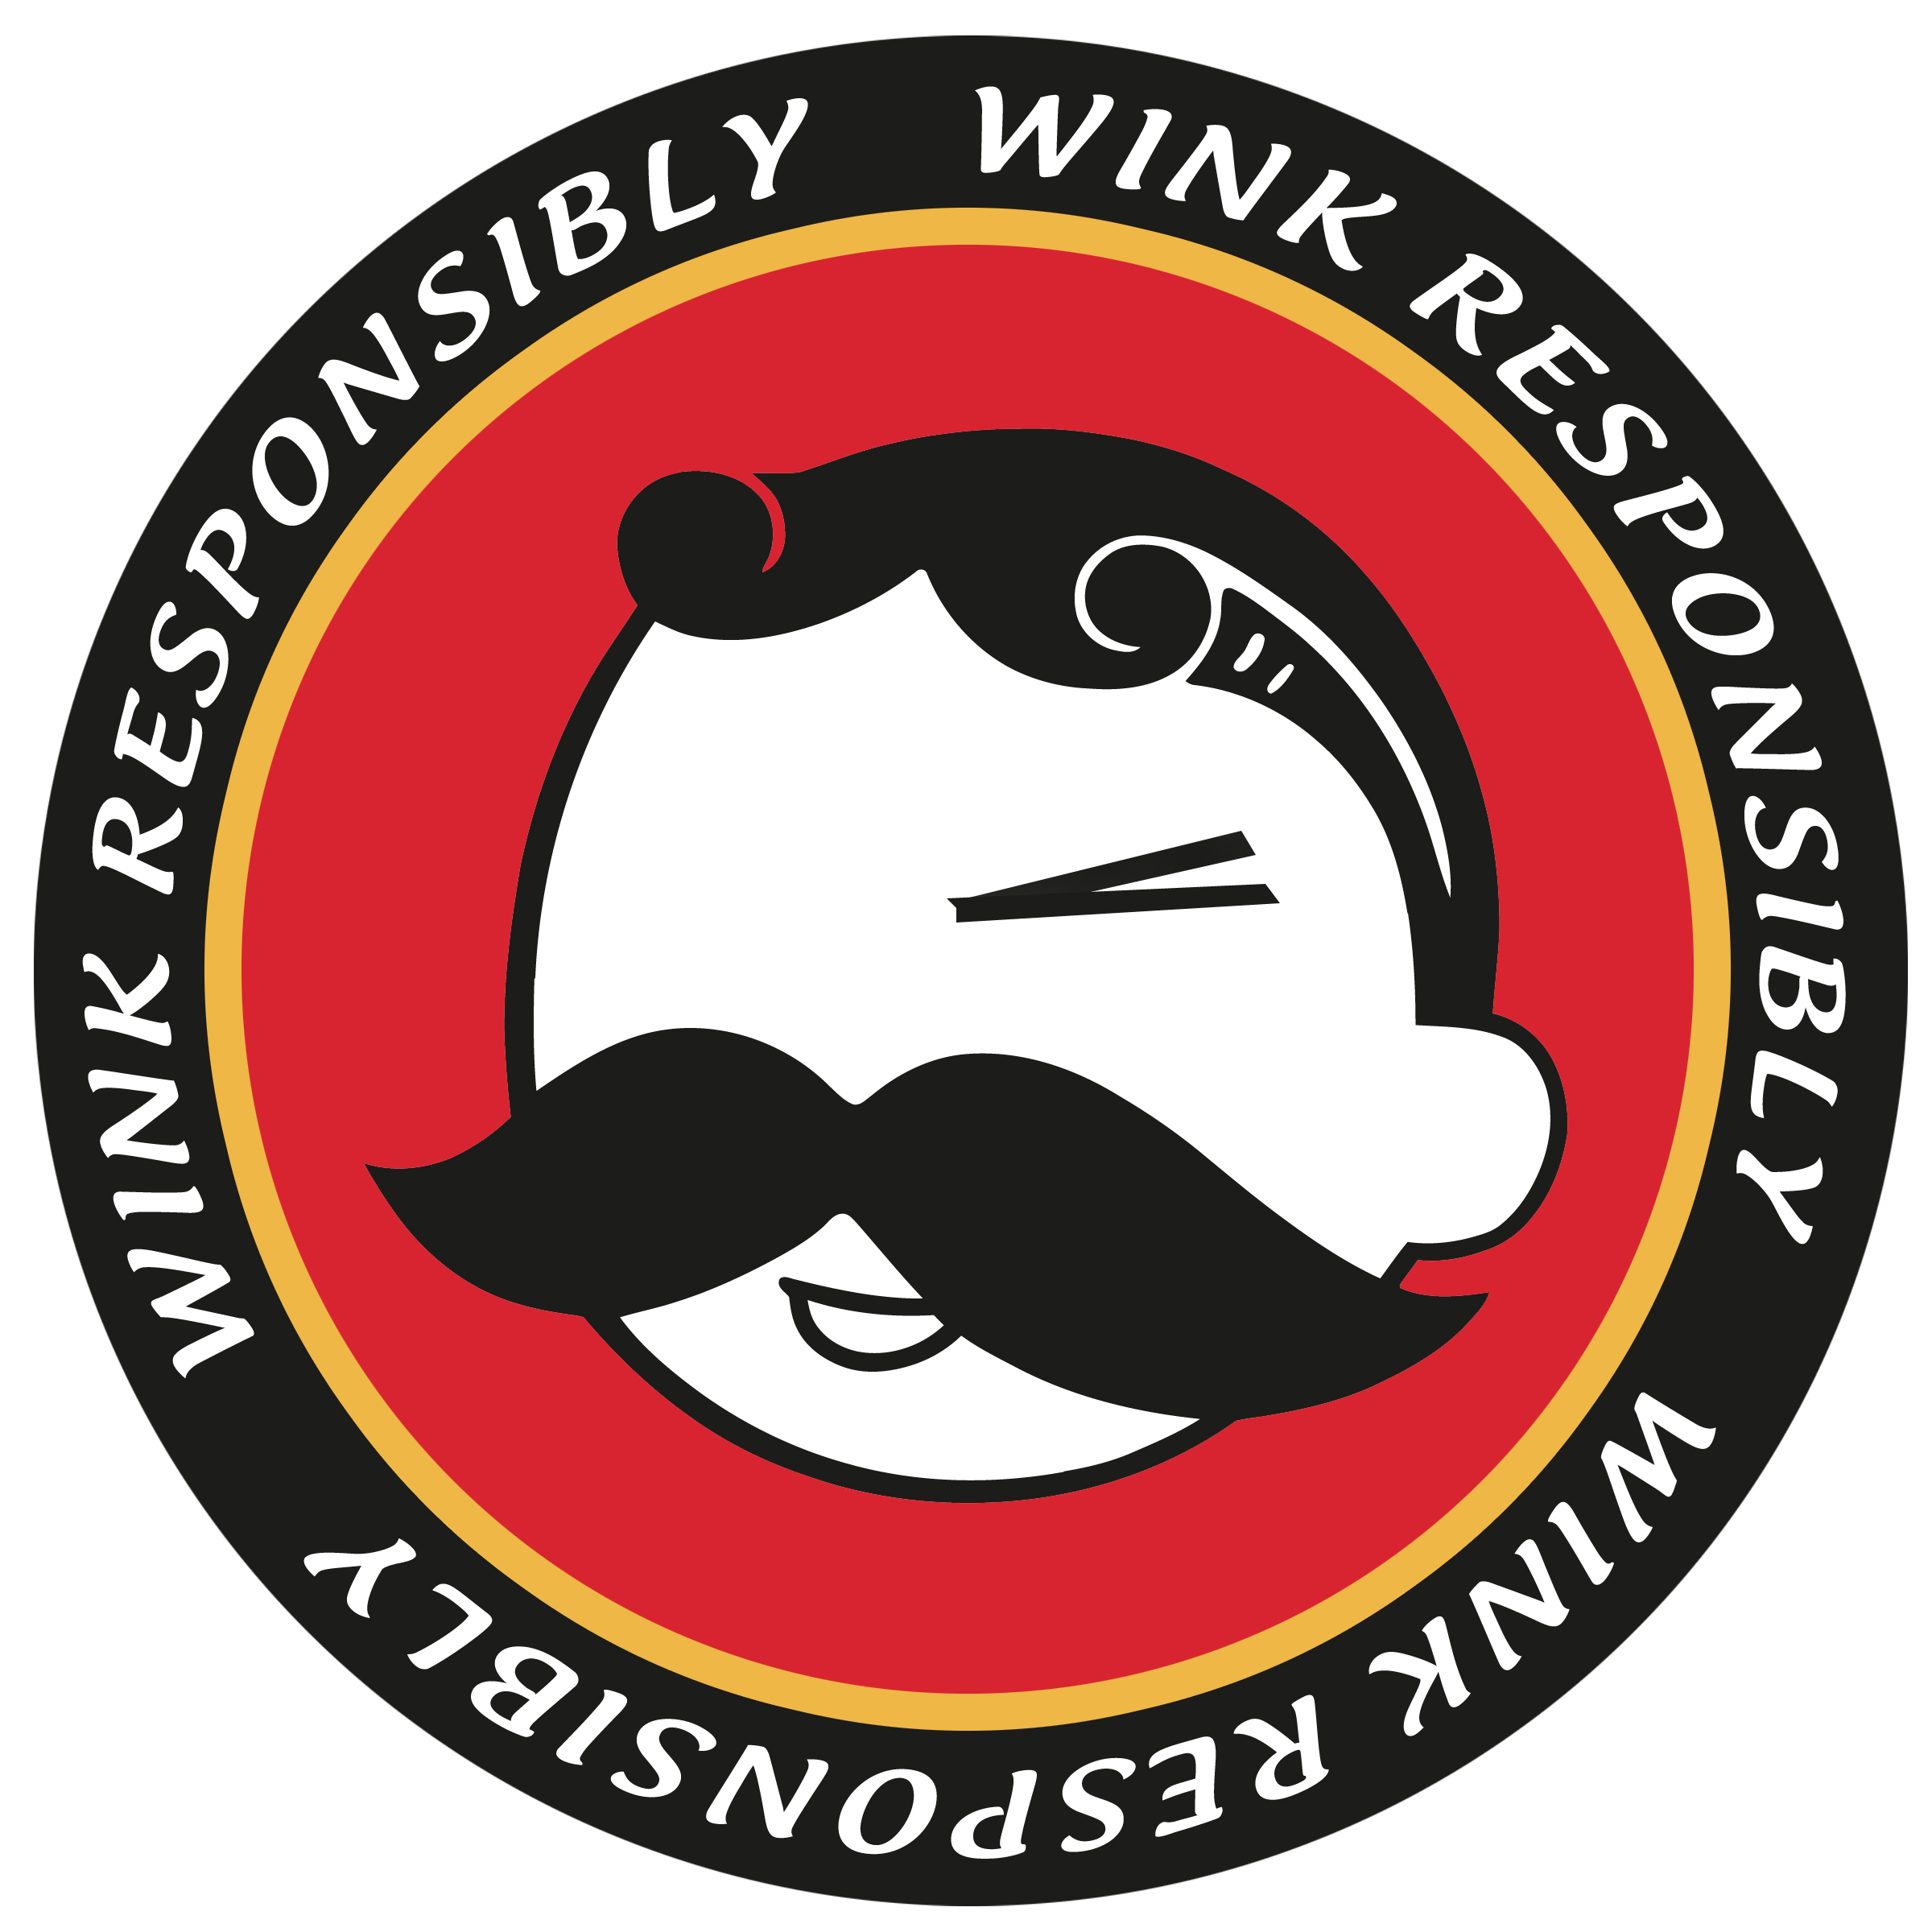 Wink Responsibly circle II.jpg